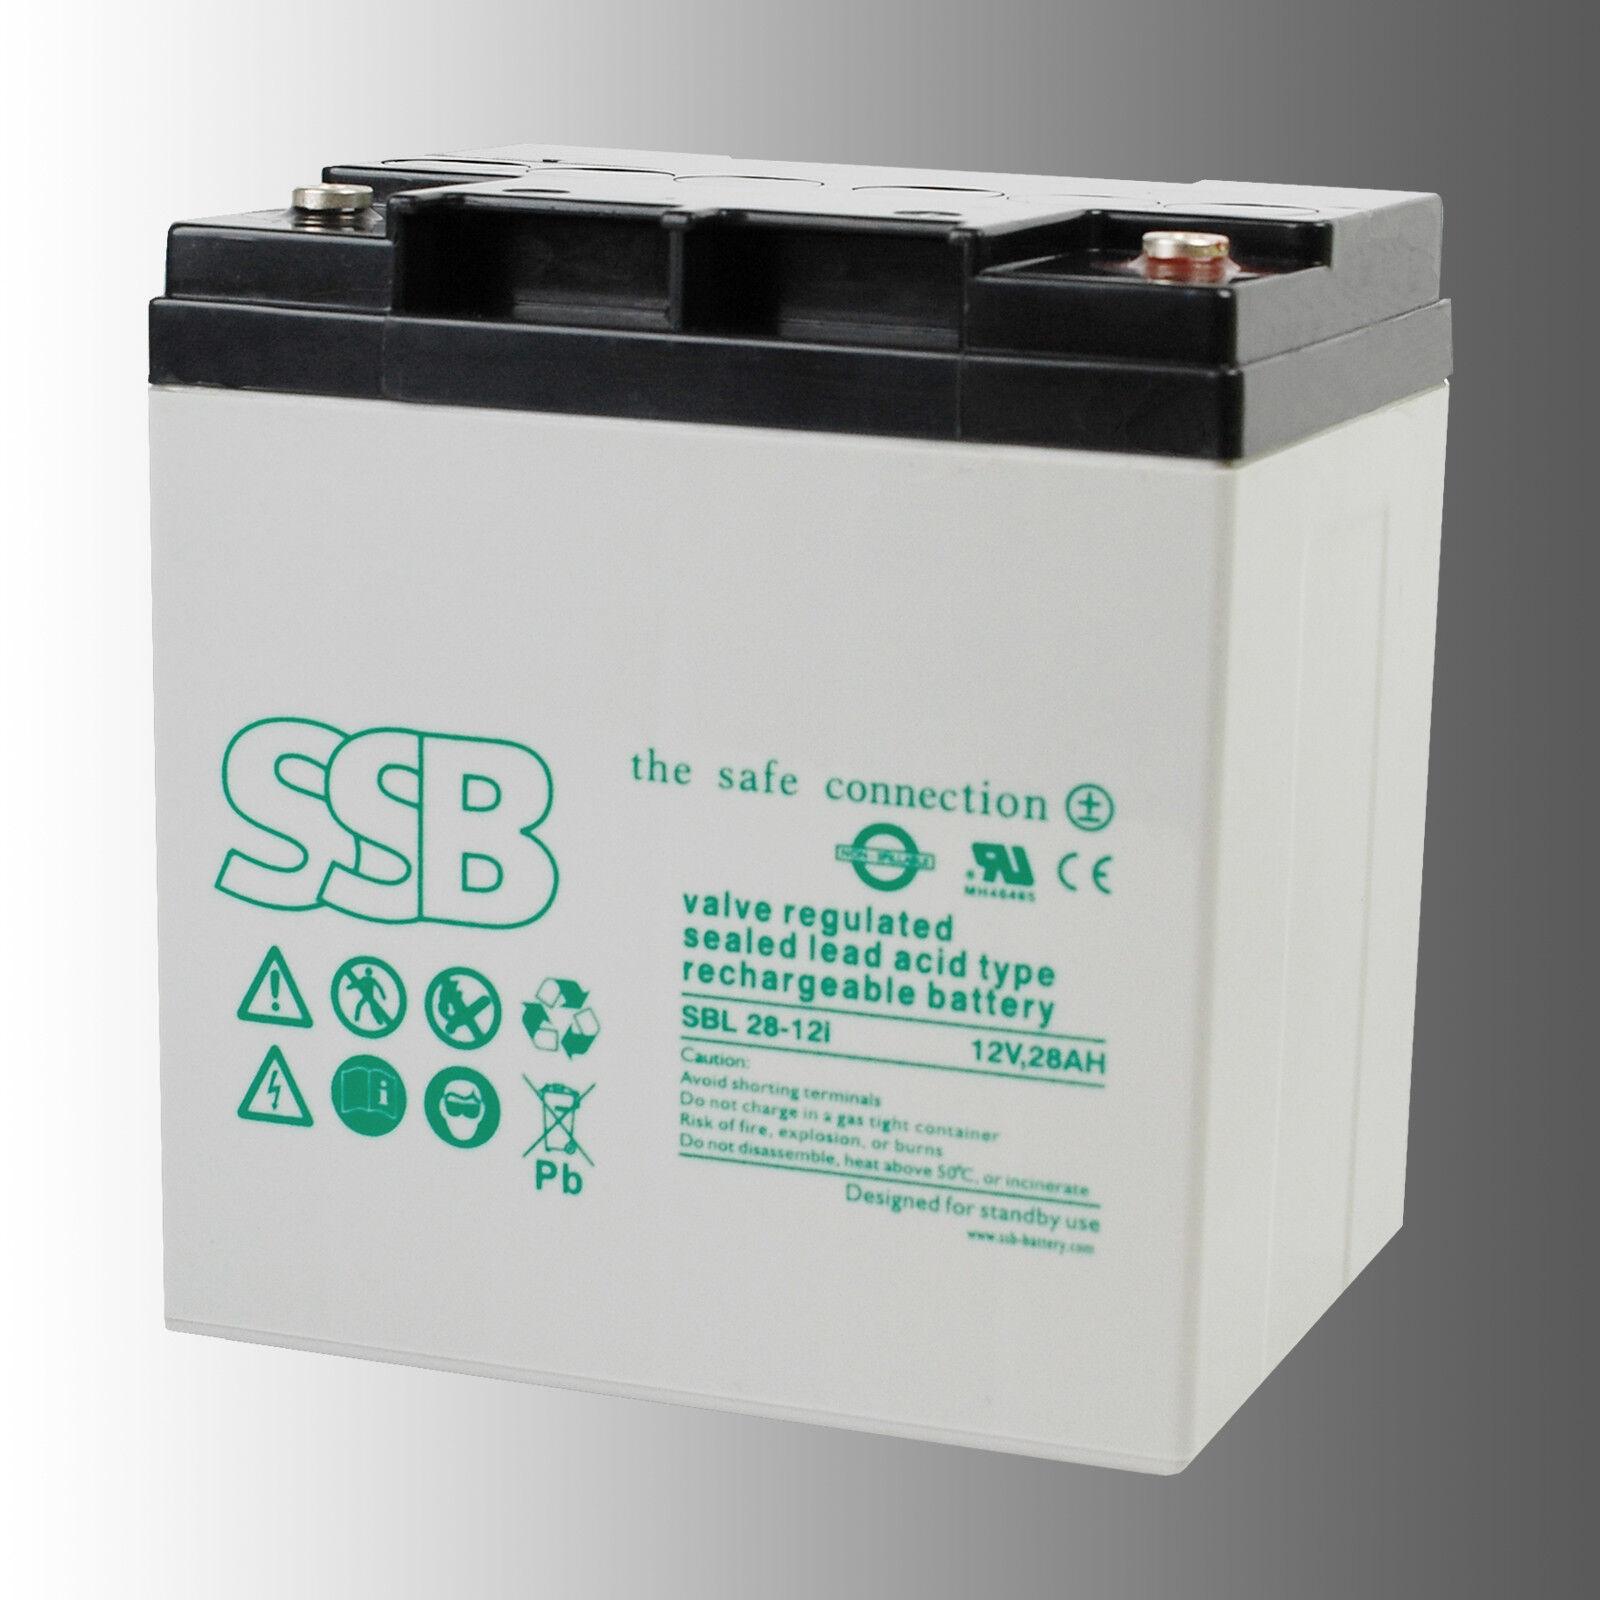 SSB Bleibatterie SBL 28-12i 12V 28Ah Longlife